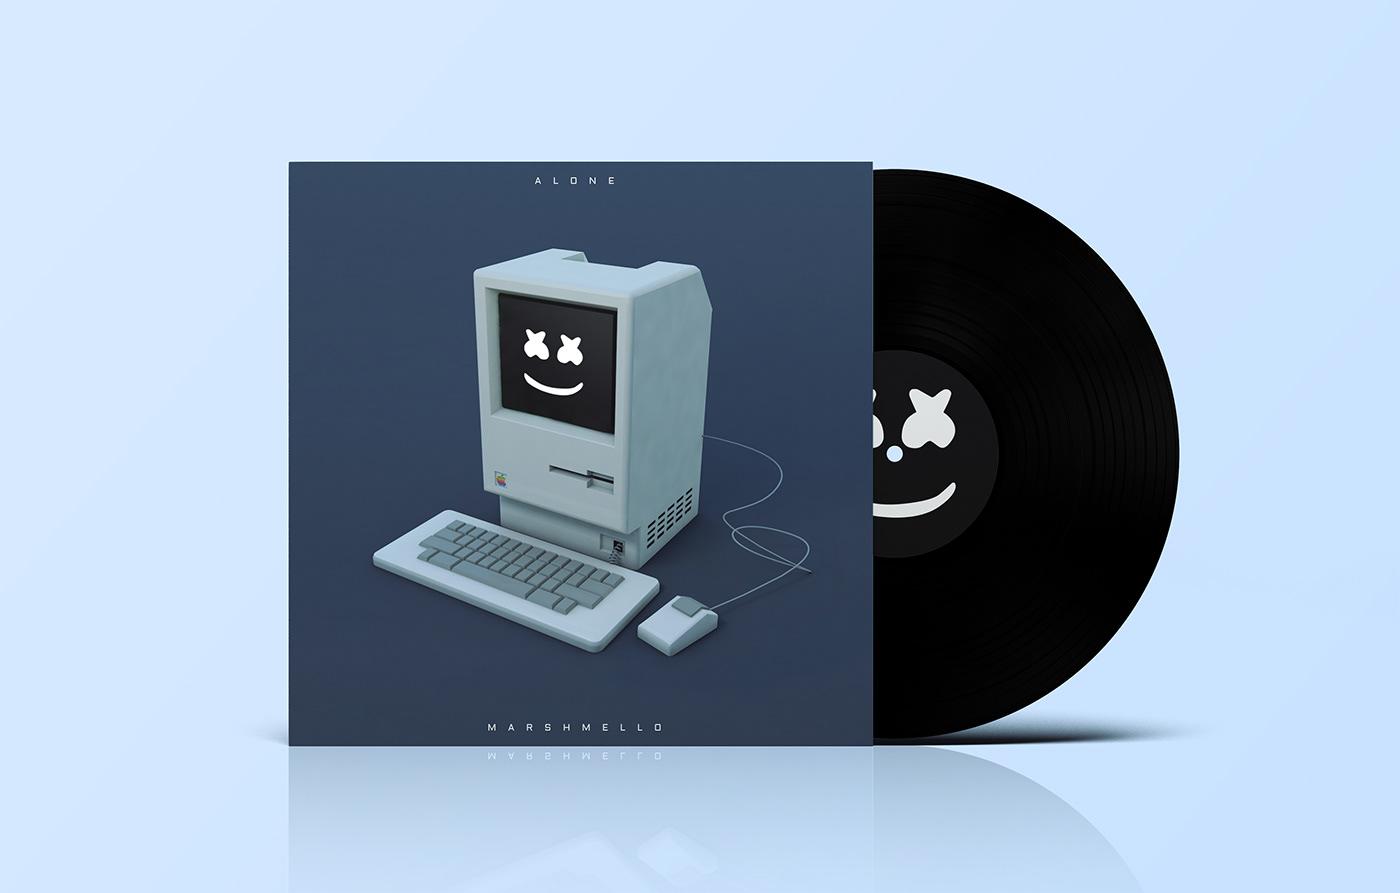 graphic design  cinema4d gif motion album cover typography   3D adobeawards